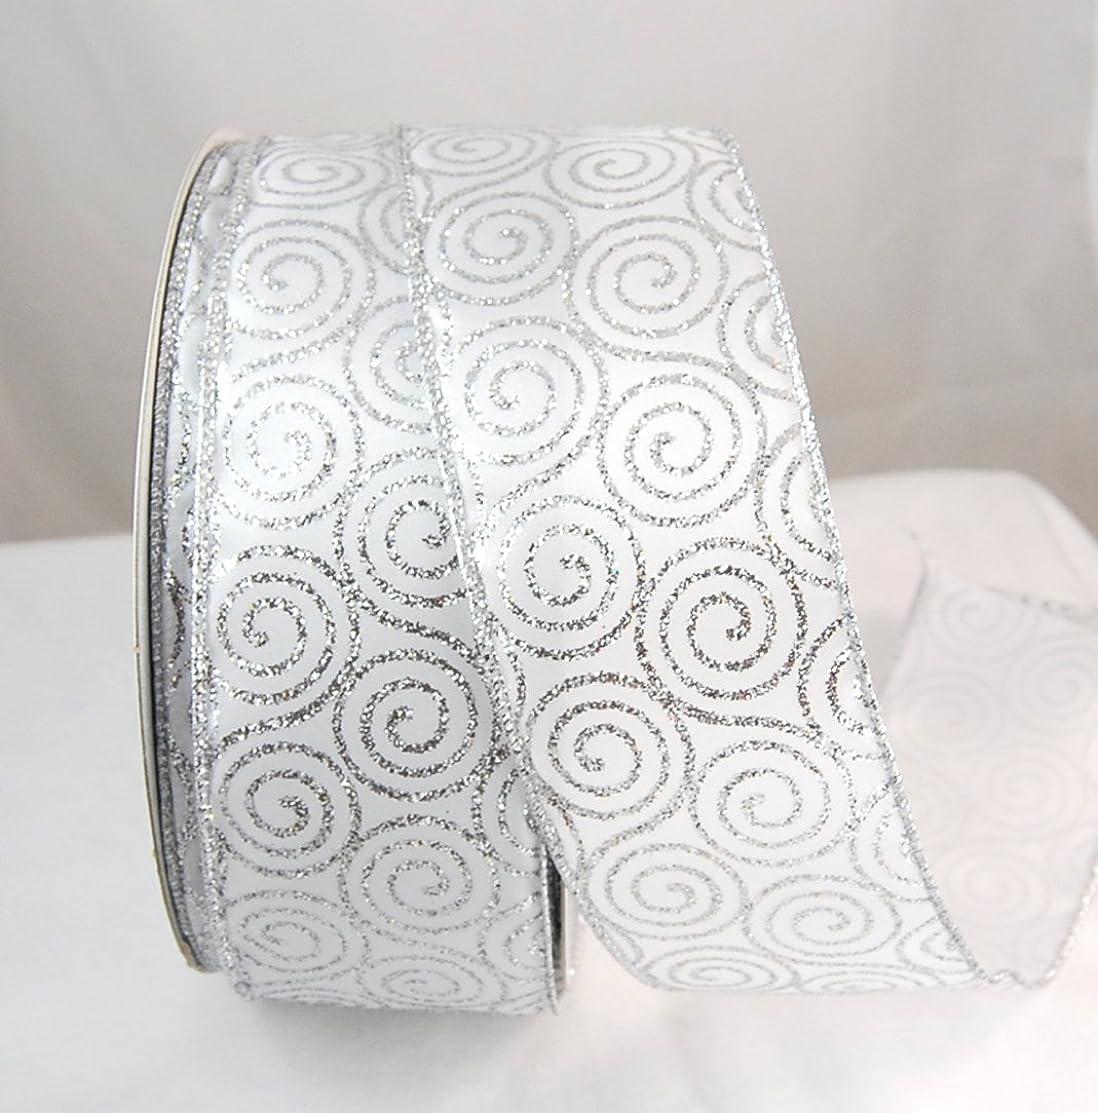 Reliant Ribbon Glitter Swirl Value Wired Edge Ribbon, 2-1/2 Inch X 50 Yards, Silver